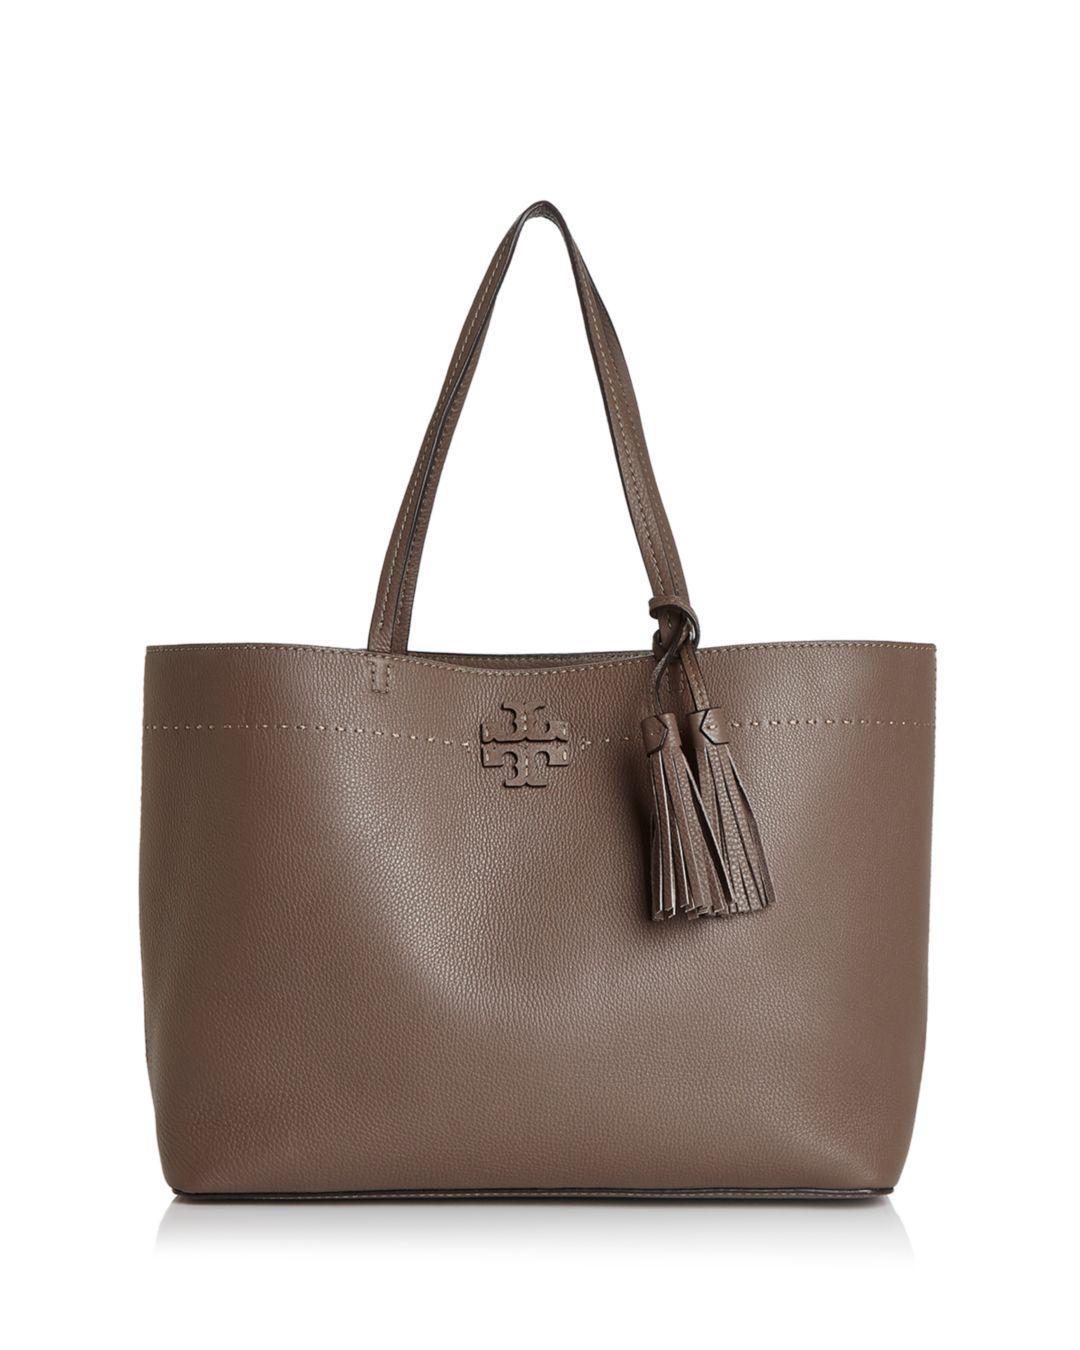 ddfde2bb4a4f Lyst - Tory Burch Mcgraw Medium Leather Tote - Save 20%